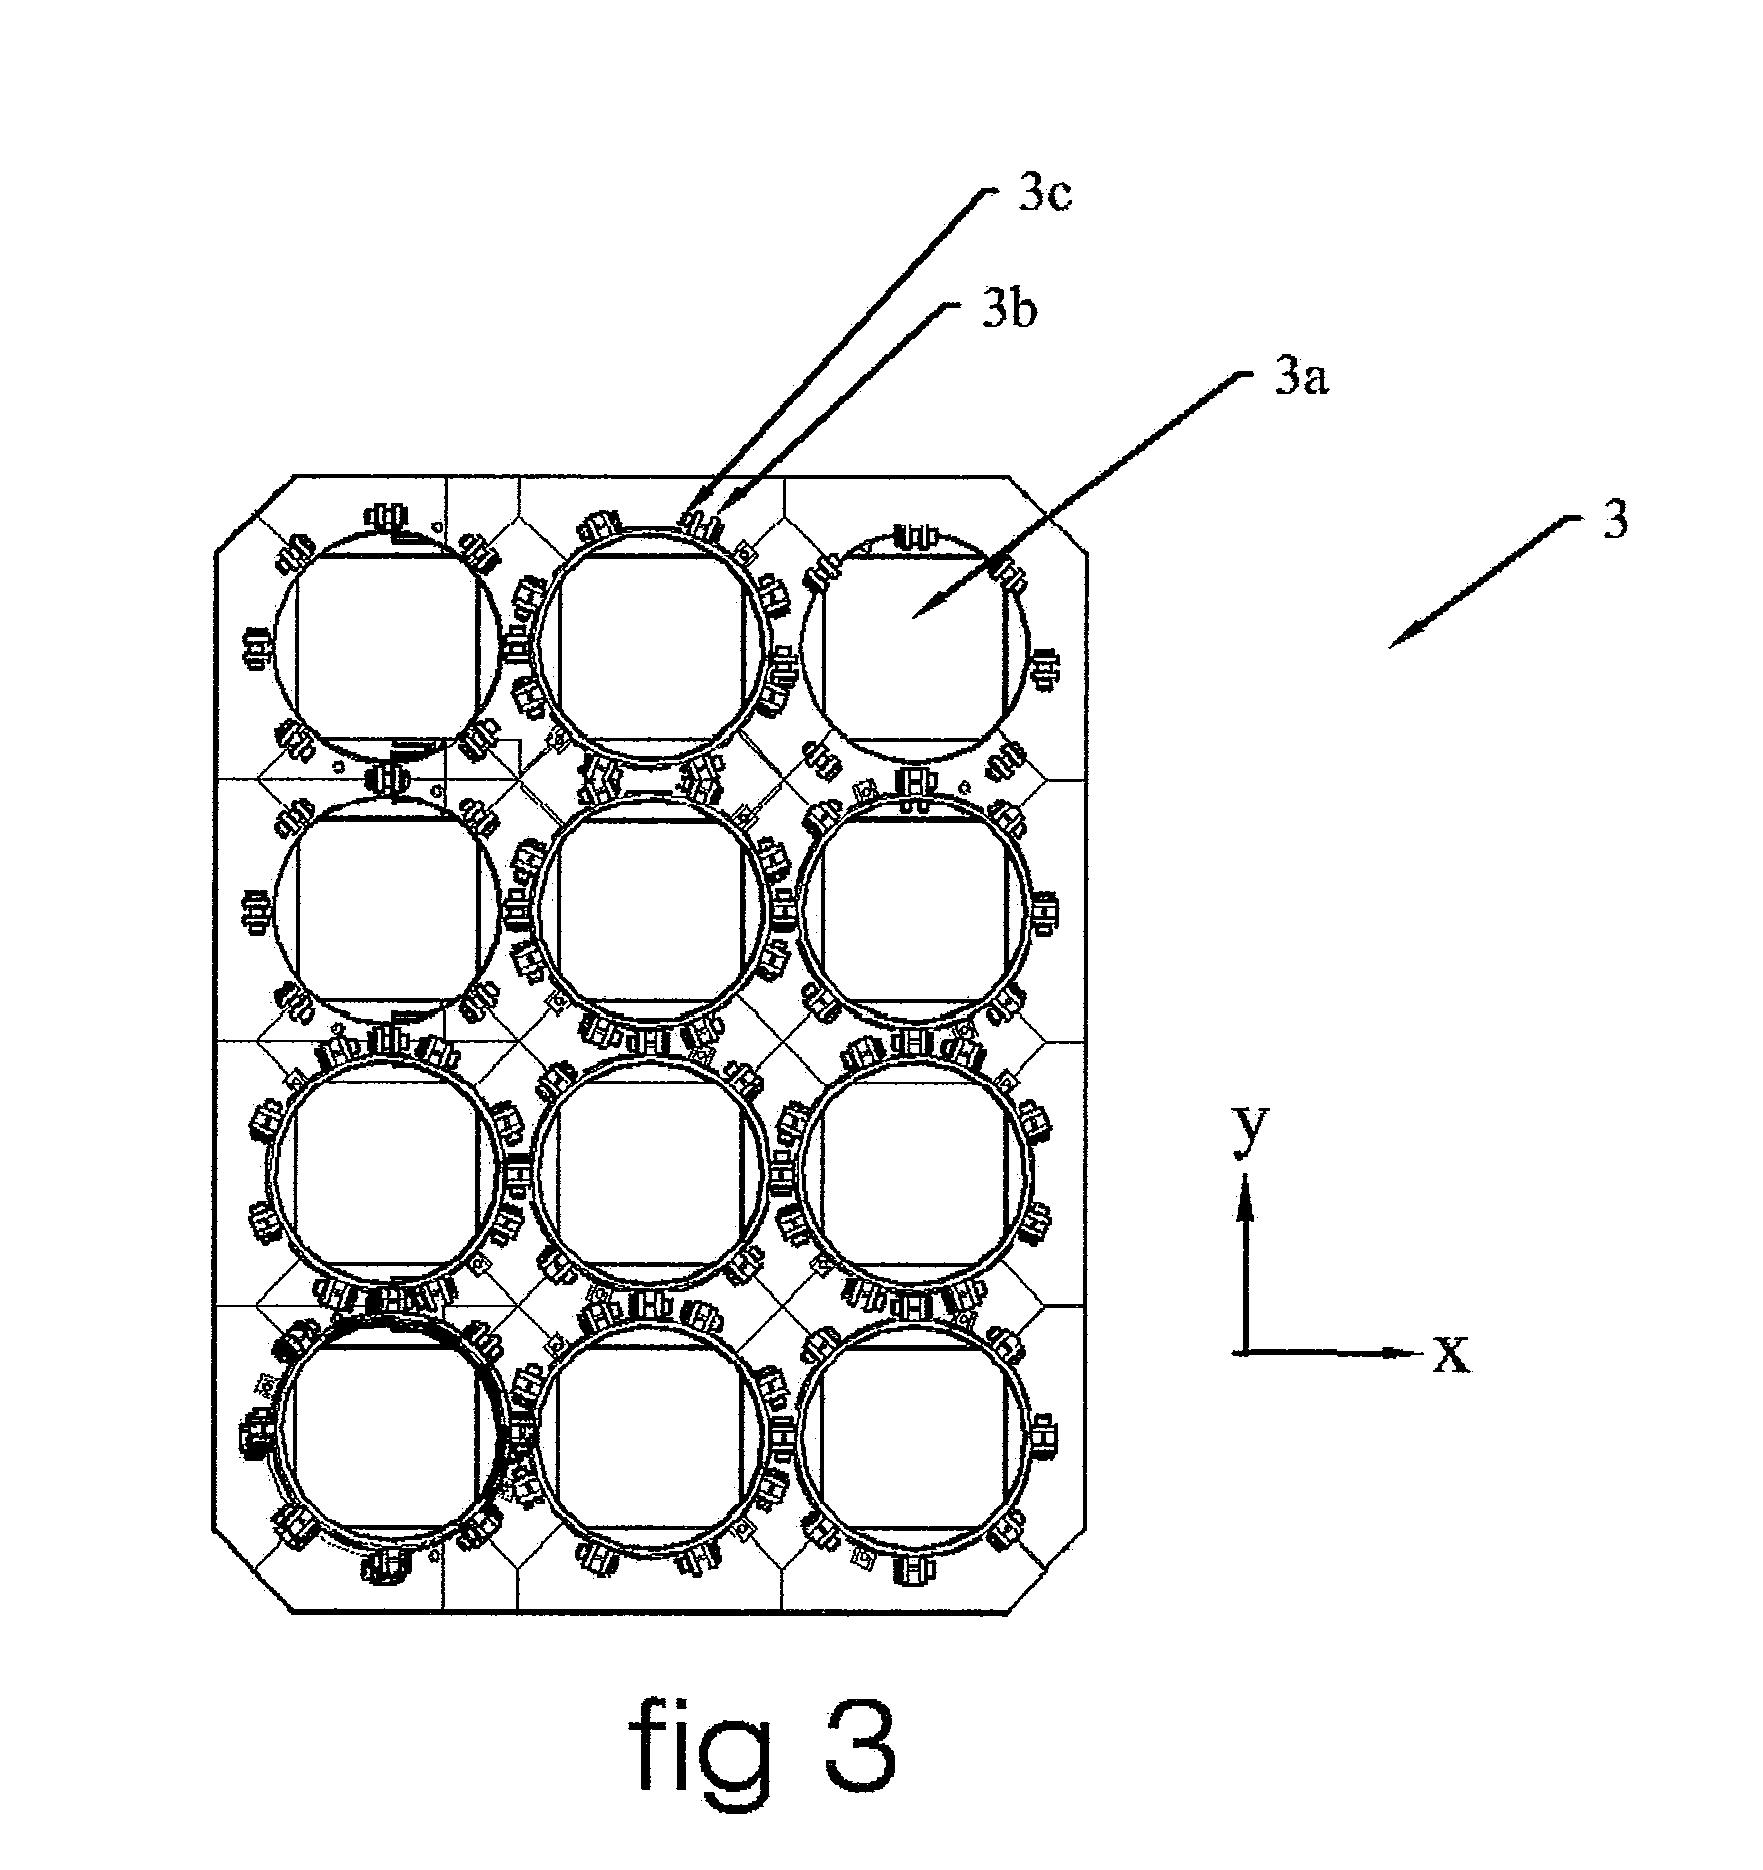 Patent Us20140193210 Adjustable Raked Pile Driver Using The Push 2000 Mitsubishi Montero Sport Fuse Diagram Drawing